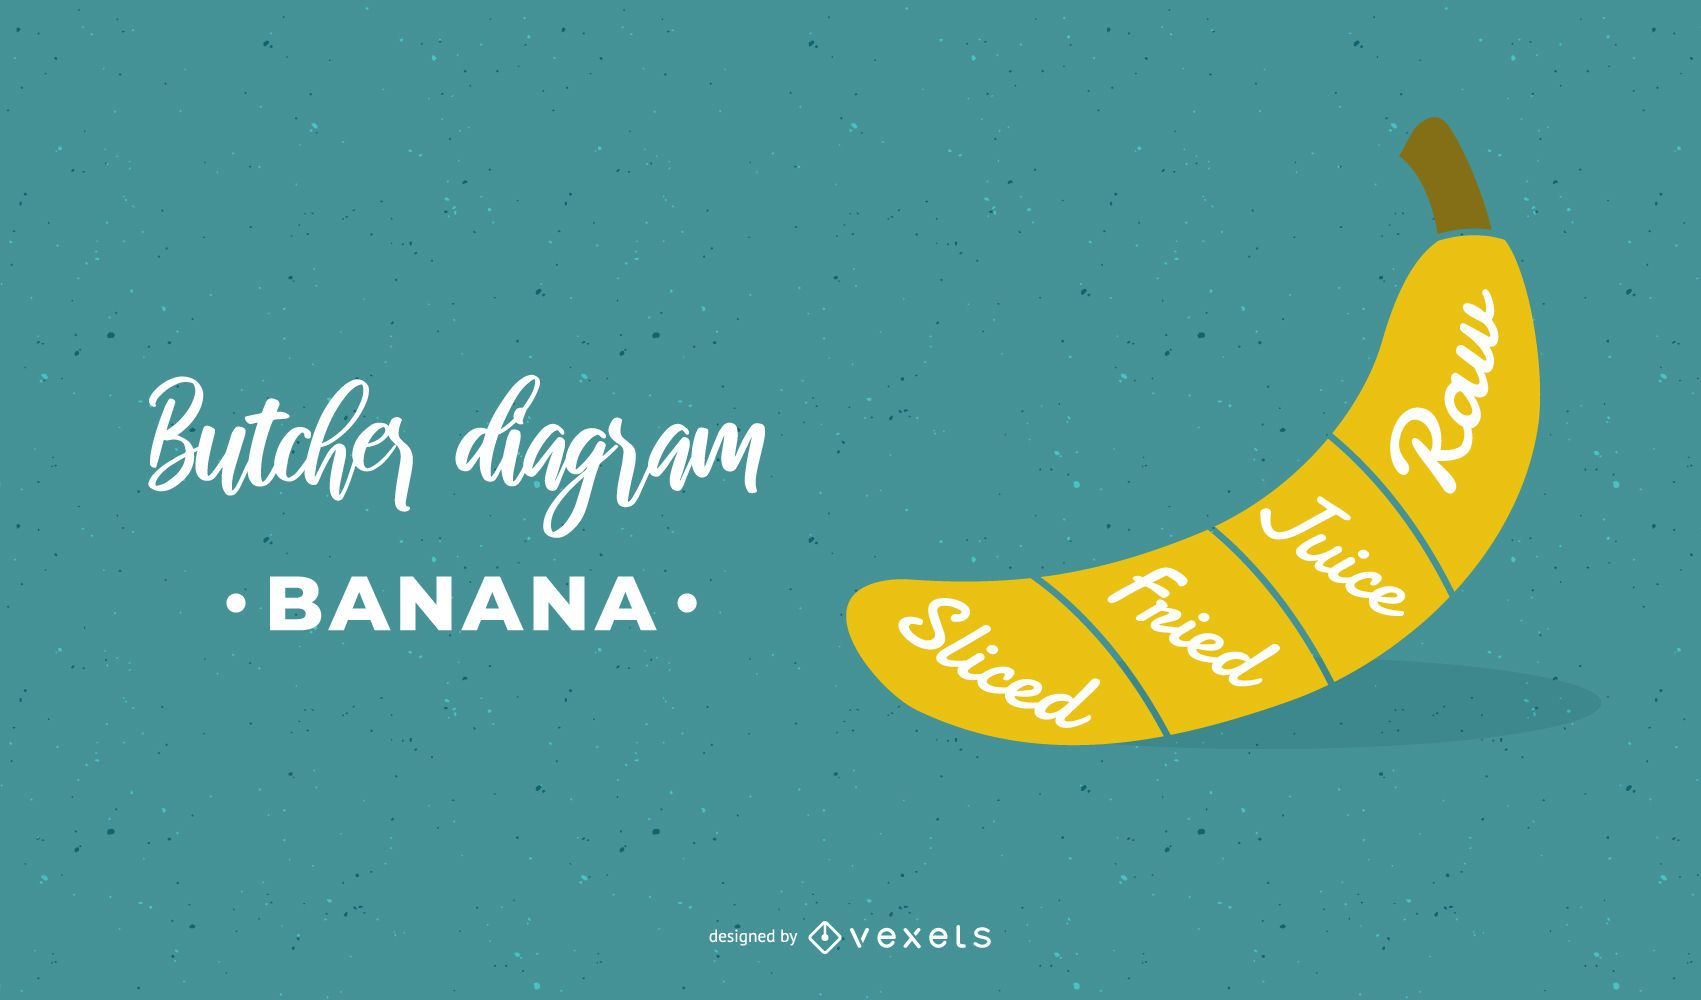 Banana Butcher Diagram Design